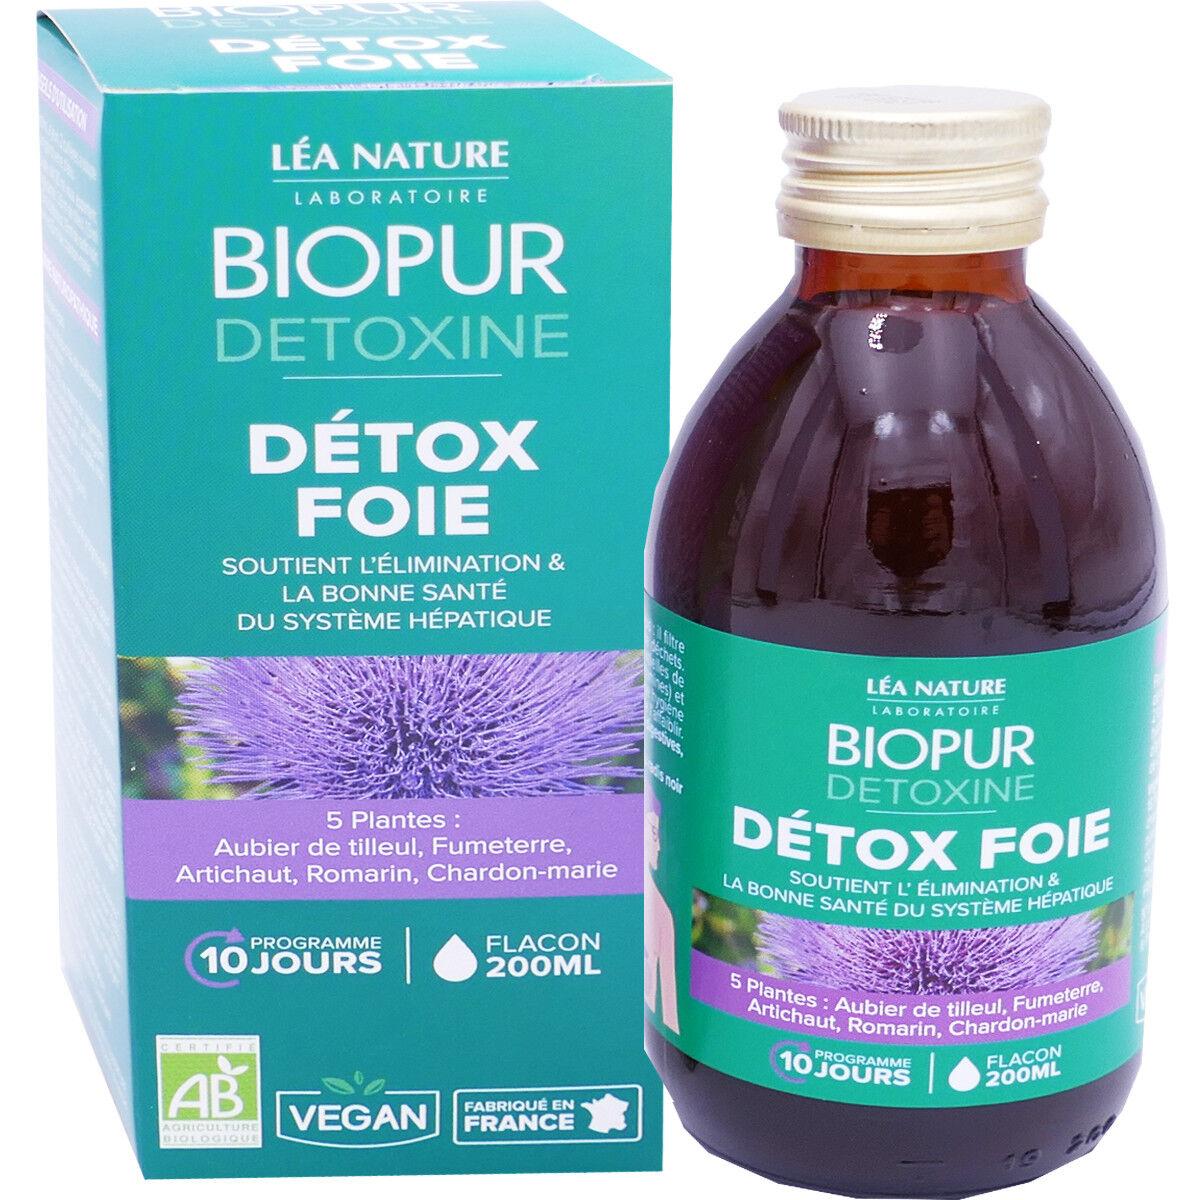 LEA NATURE Biopur detox foie 200 ml bio